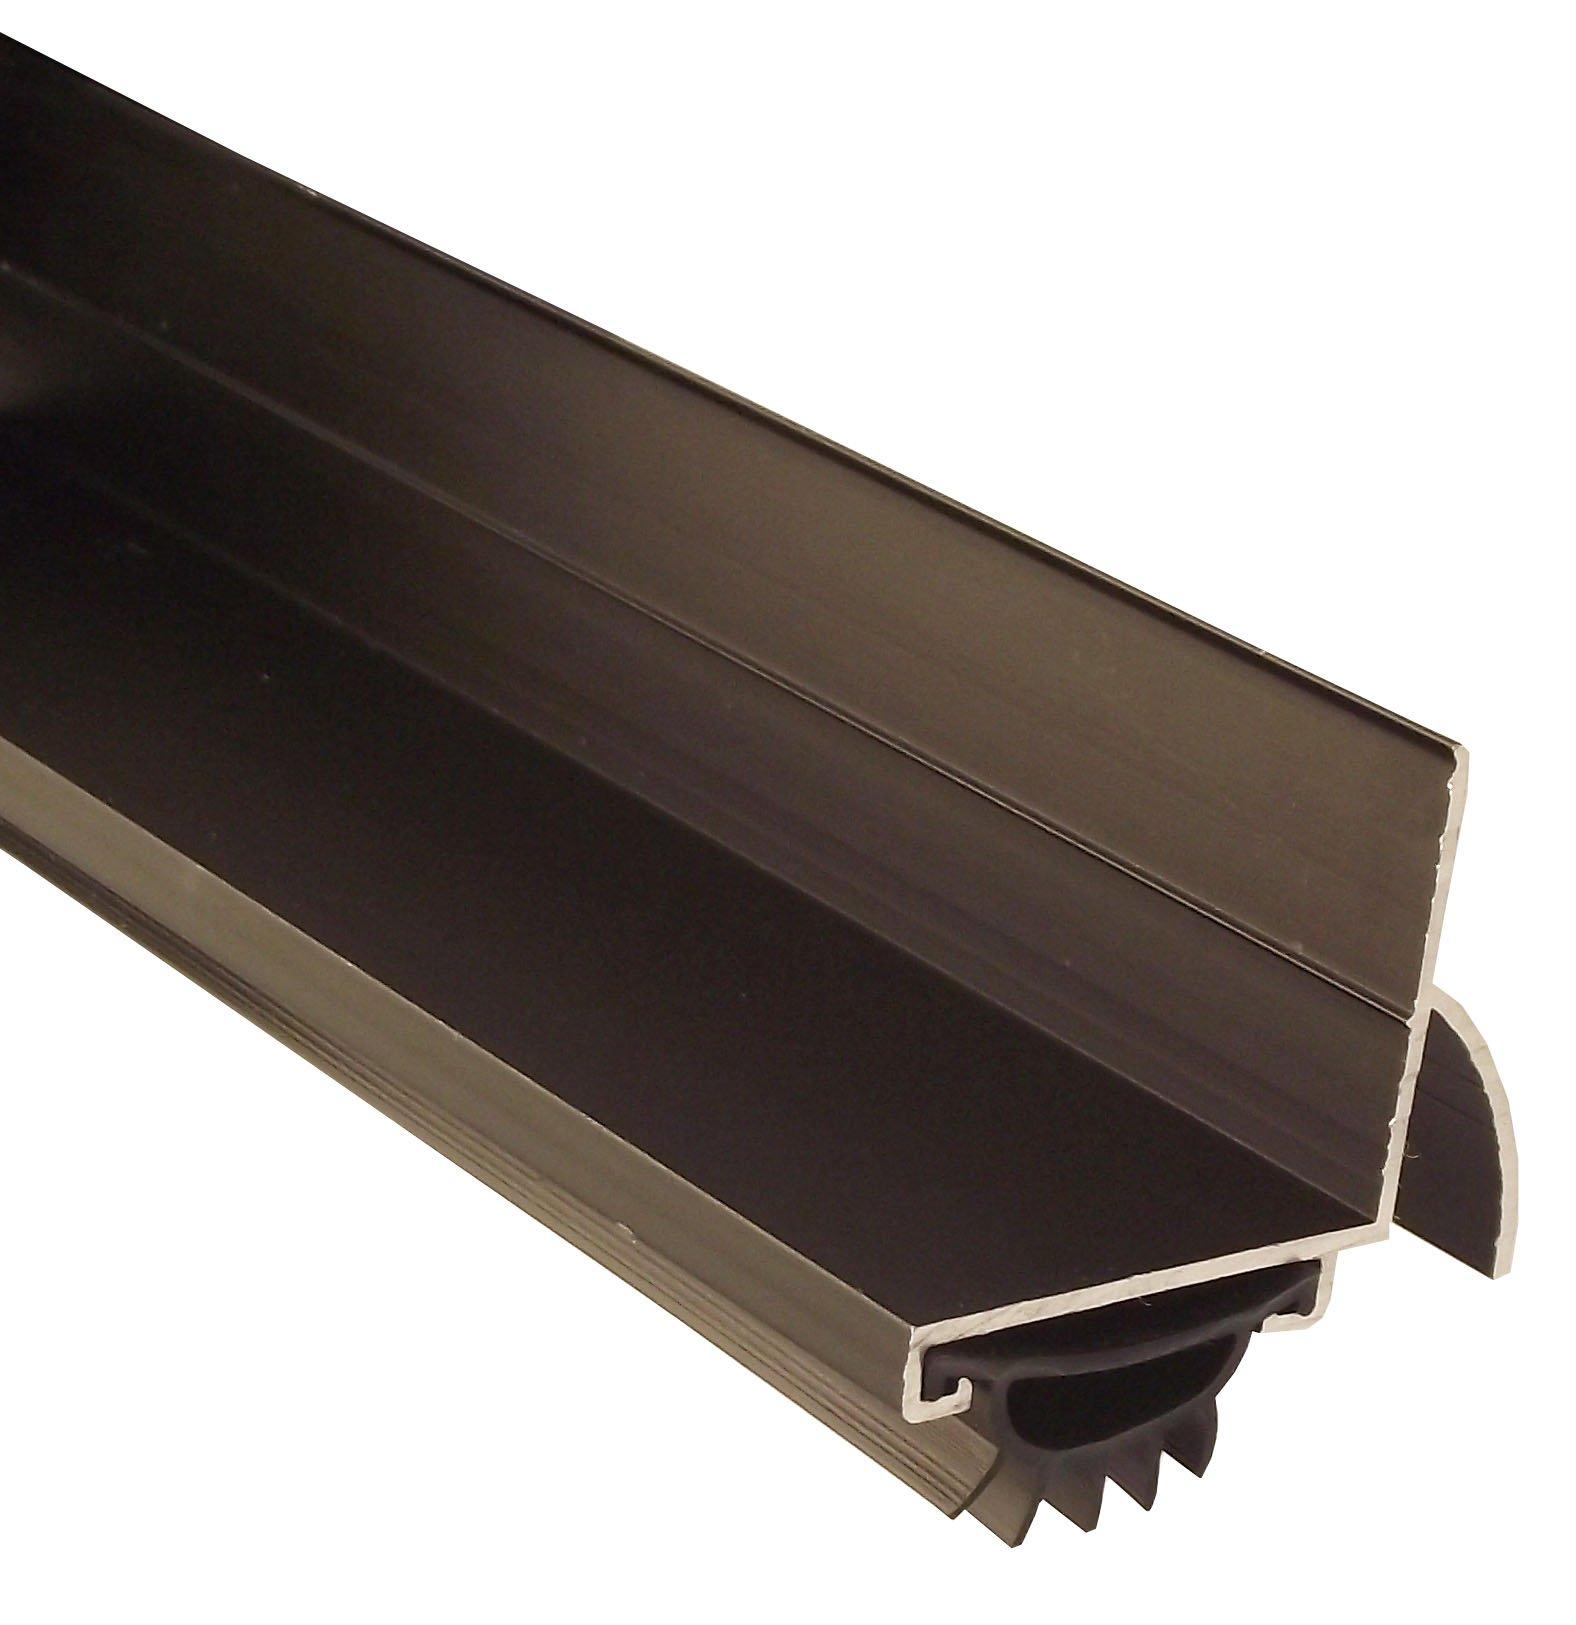 Pemko 085589 210DV36 Door Shoe, Dark Bronze Finish with Black Eco-V Insert, 2'' Width, 36'' Length, Dark Bronze